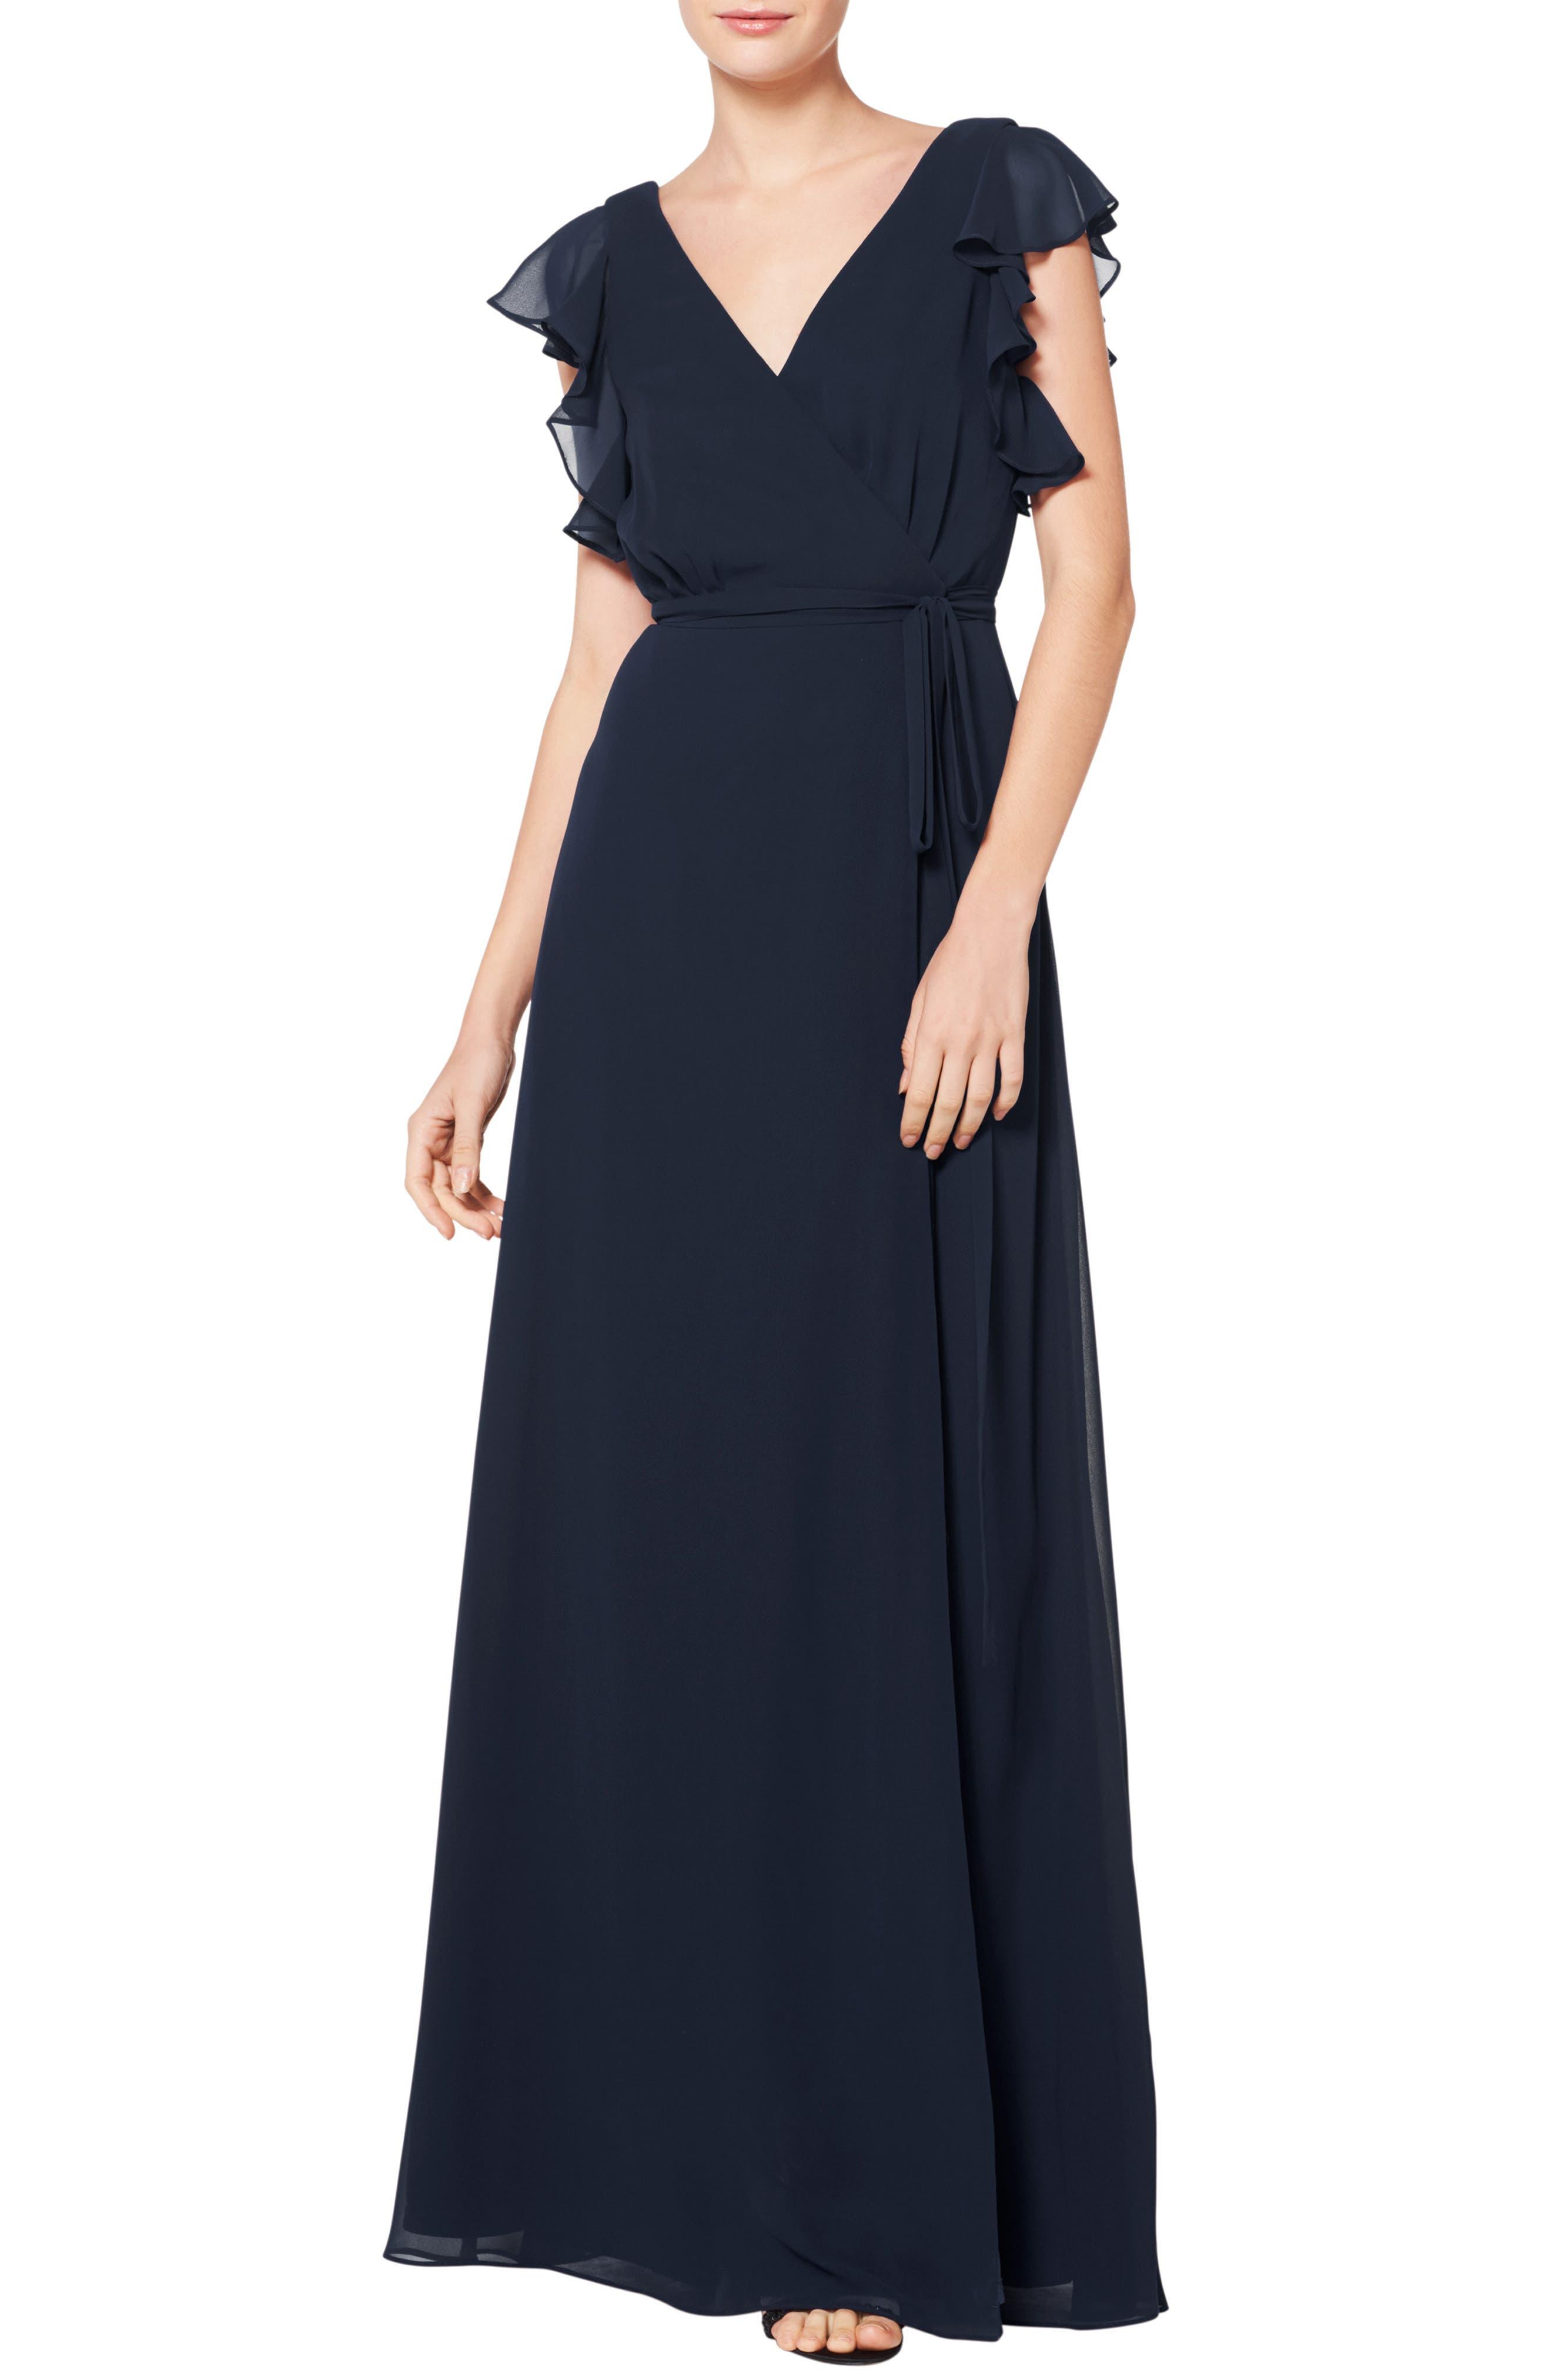 #LEVKOFF, Ruffle Sleeve Chiffon Wrap Evening Dress, Main thumbnail 1, color, NAVY